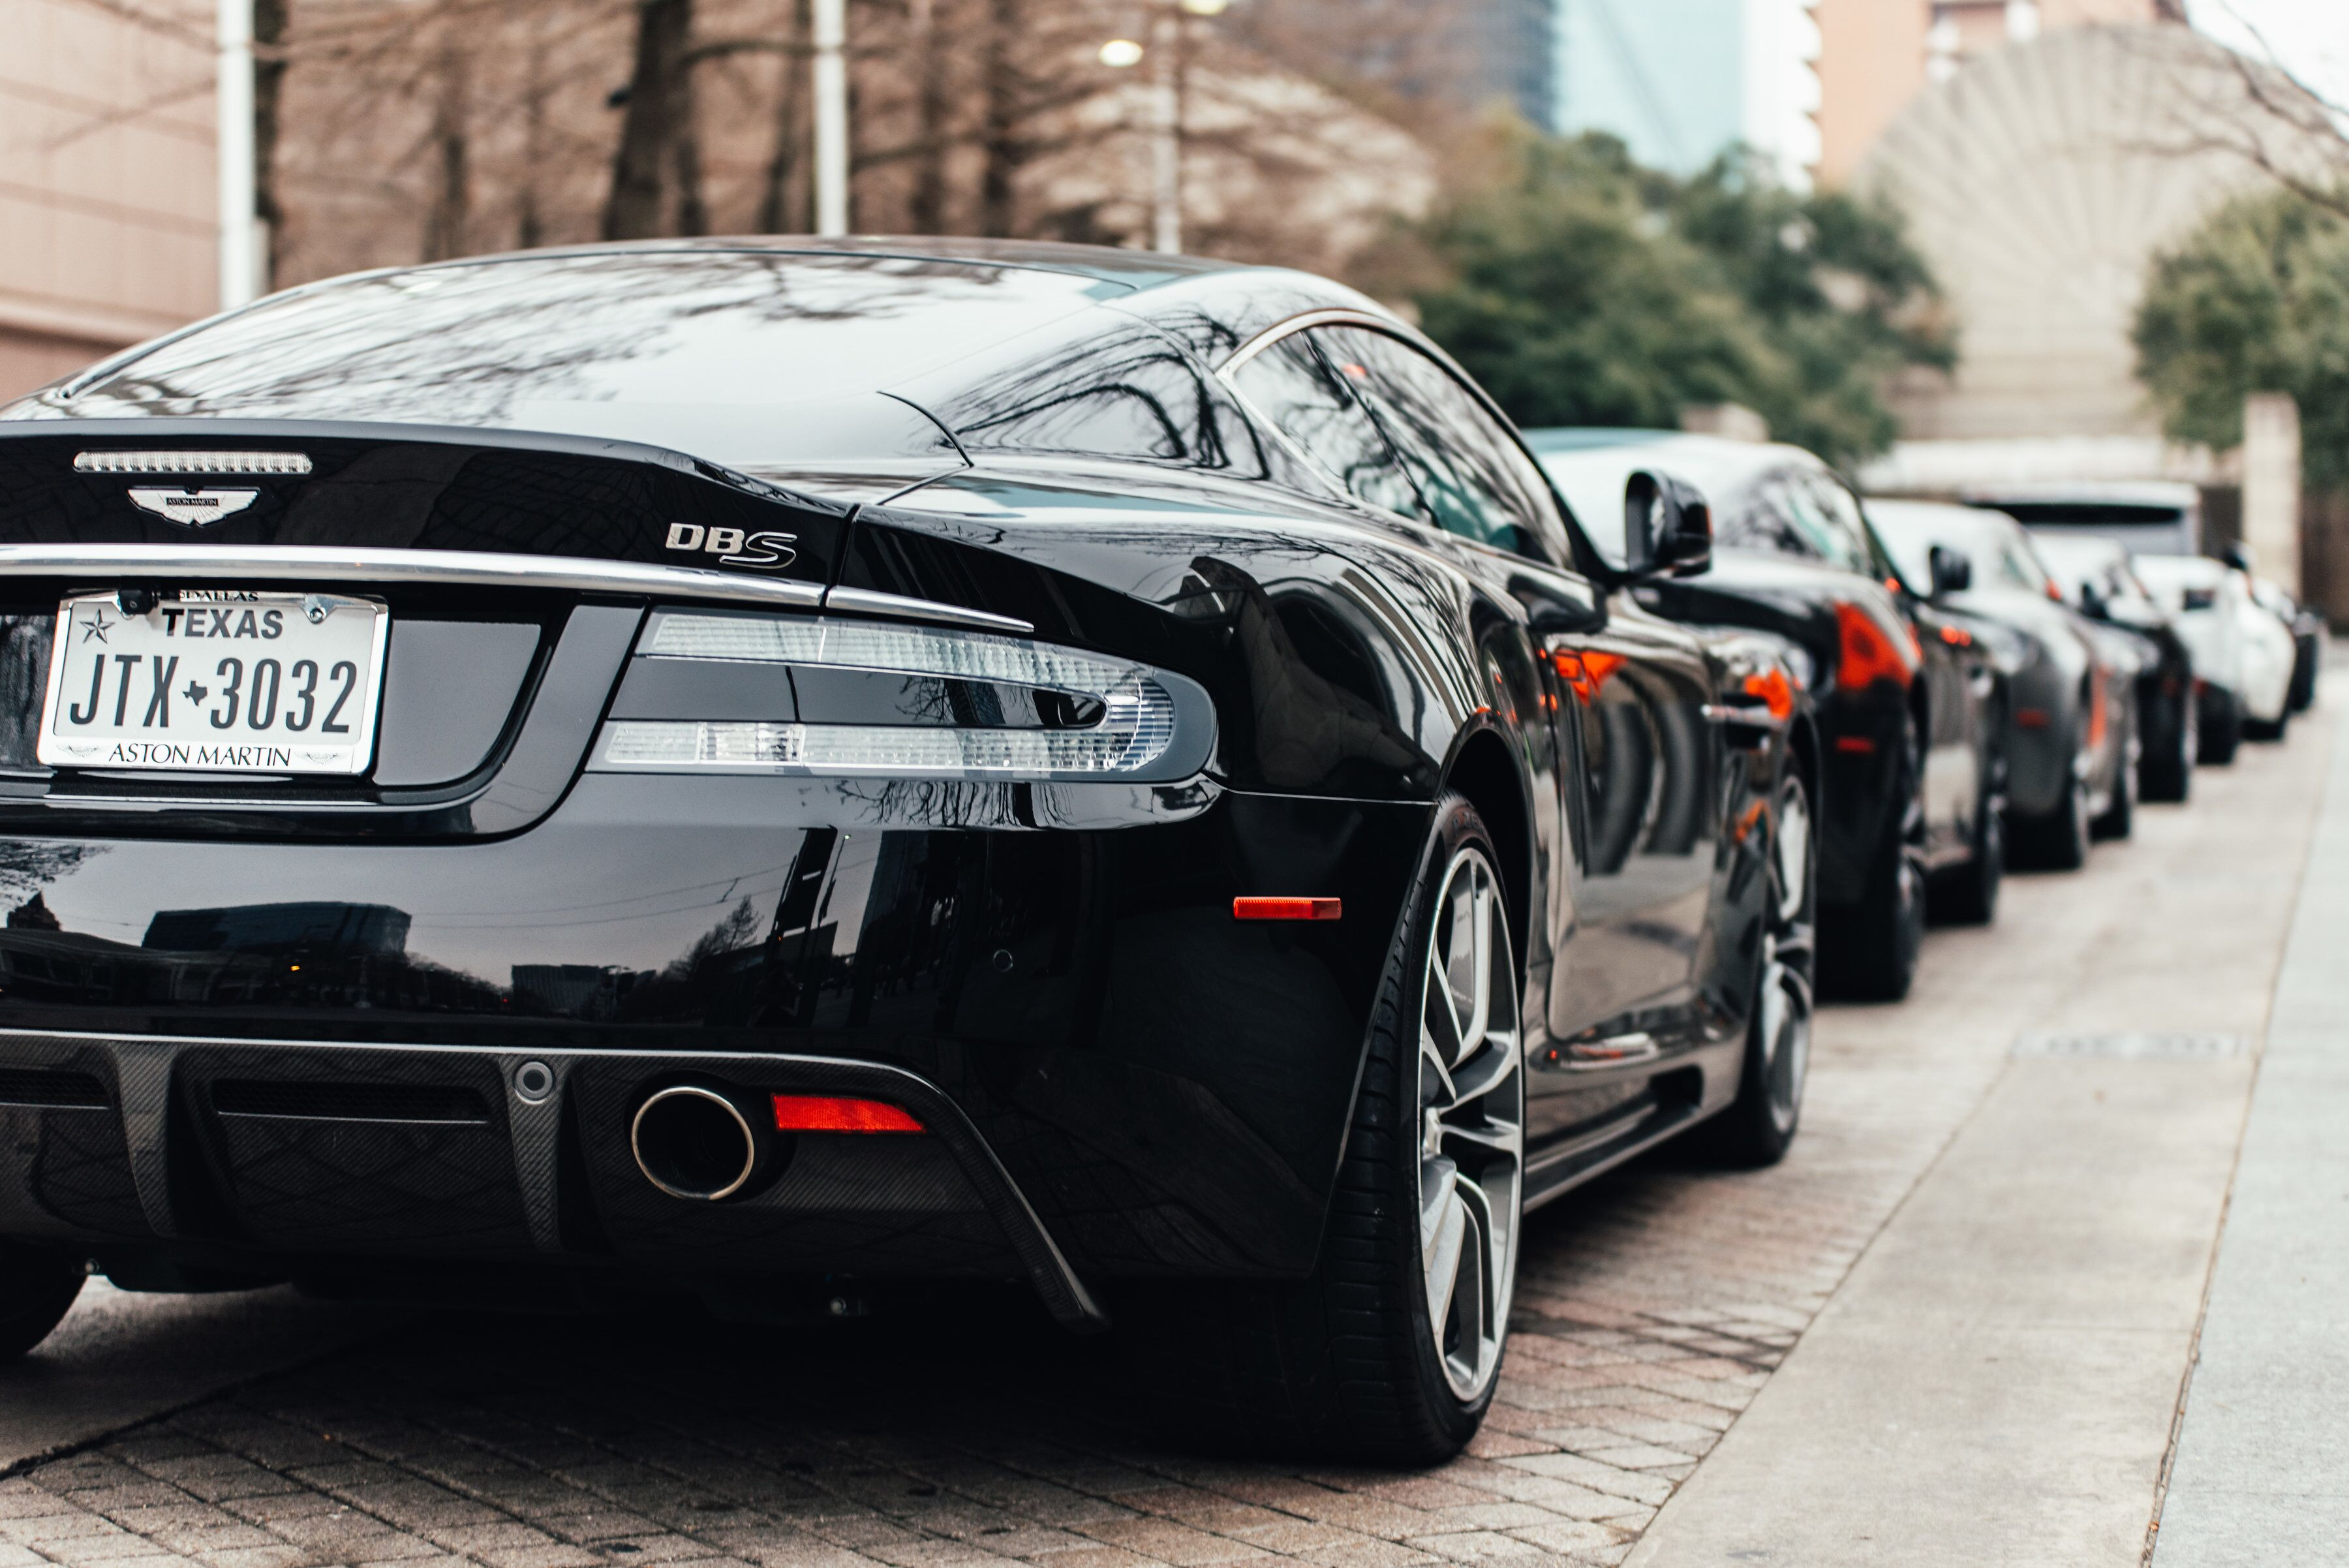 Dallas Texas Aston Martin Dealership Aston Martin Of Dallas - Aston martin dealership texas